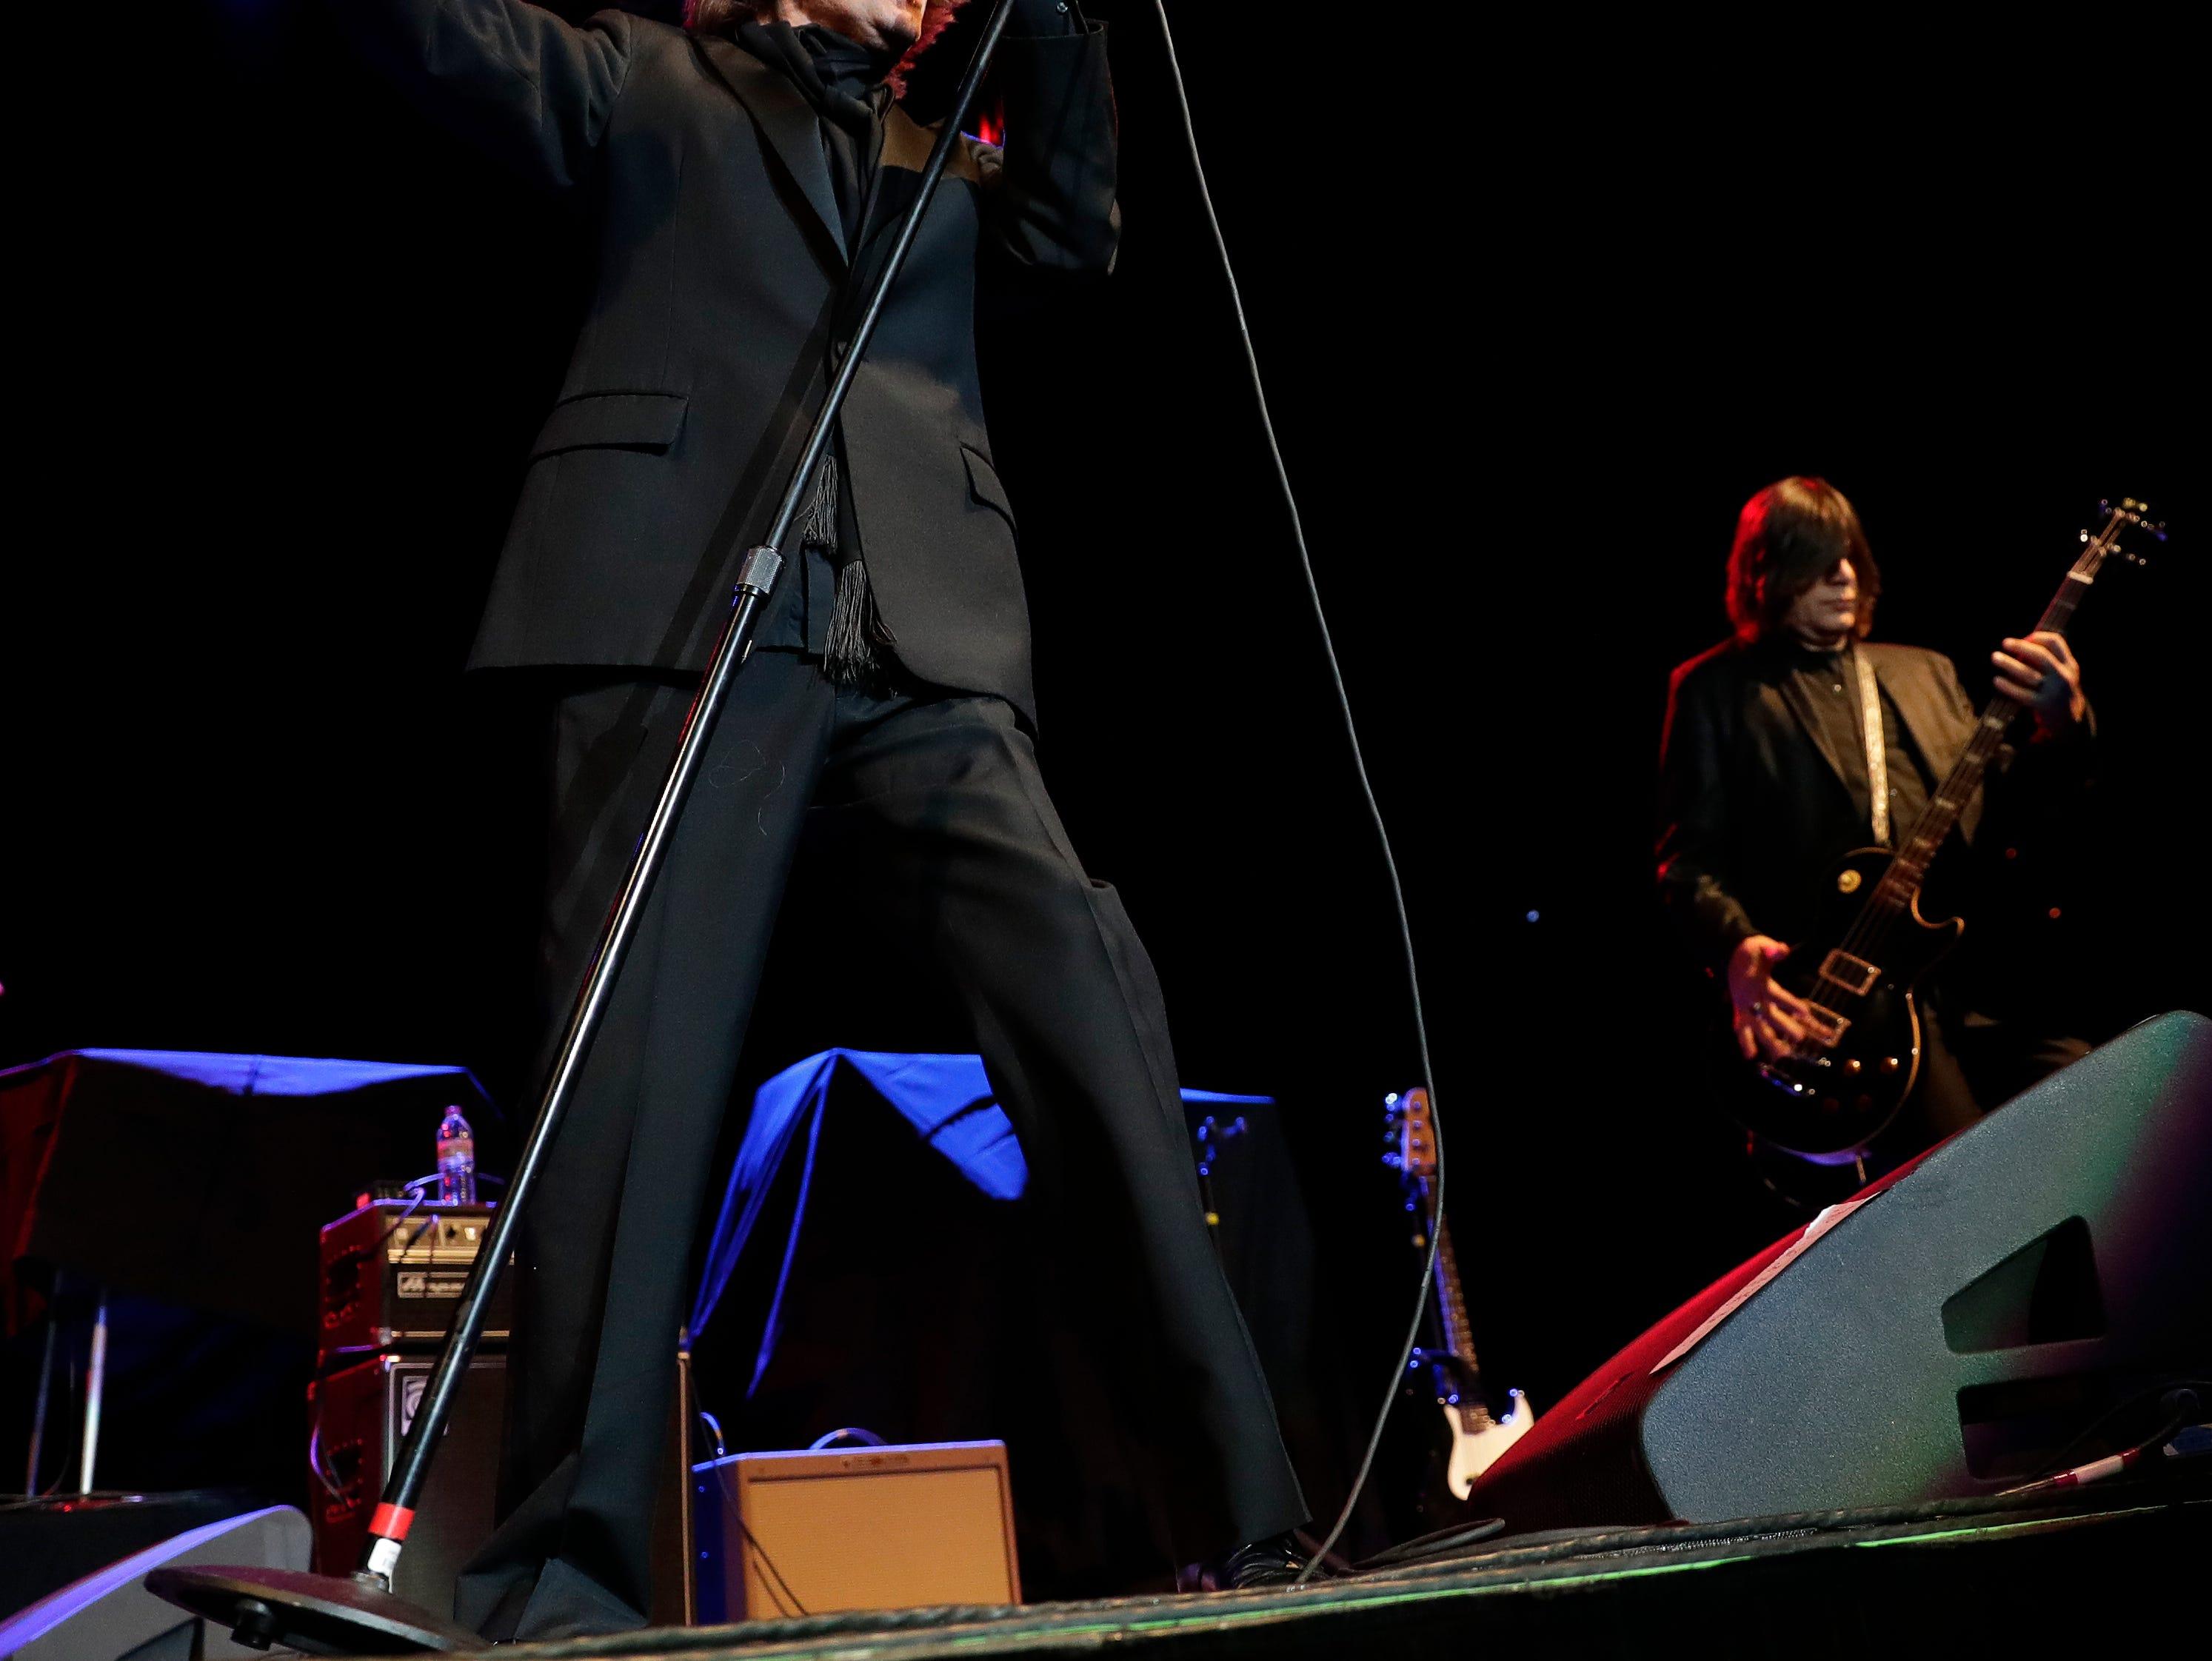 John Waite performs Dec. 29, 2018 at the Resch Center in Ashwaubenon, Wis.